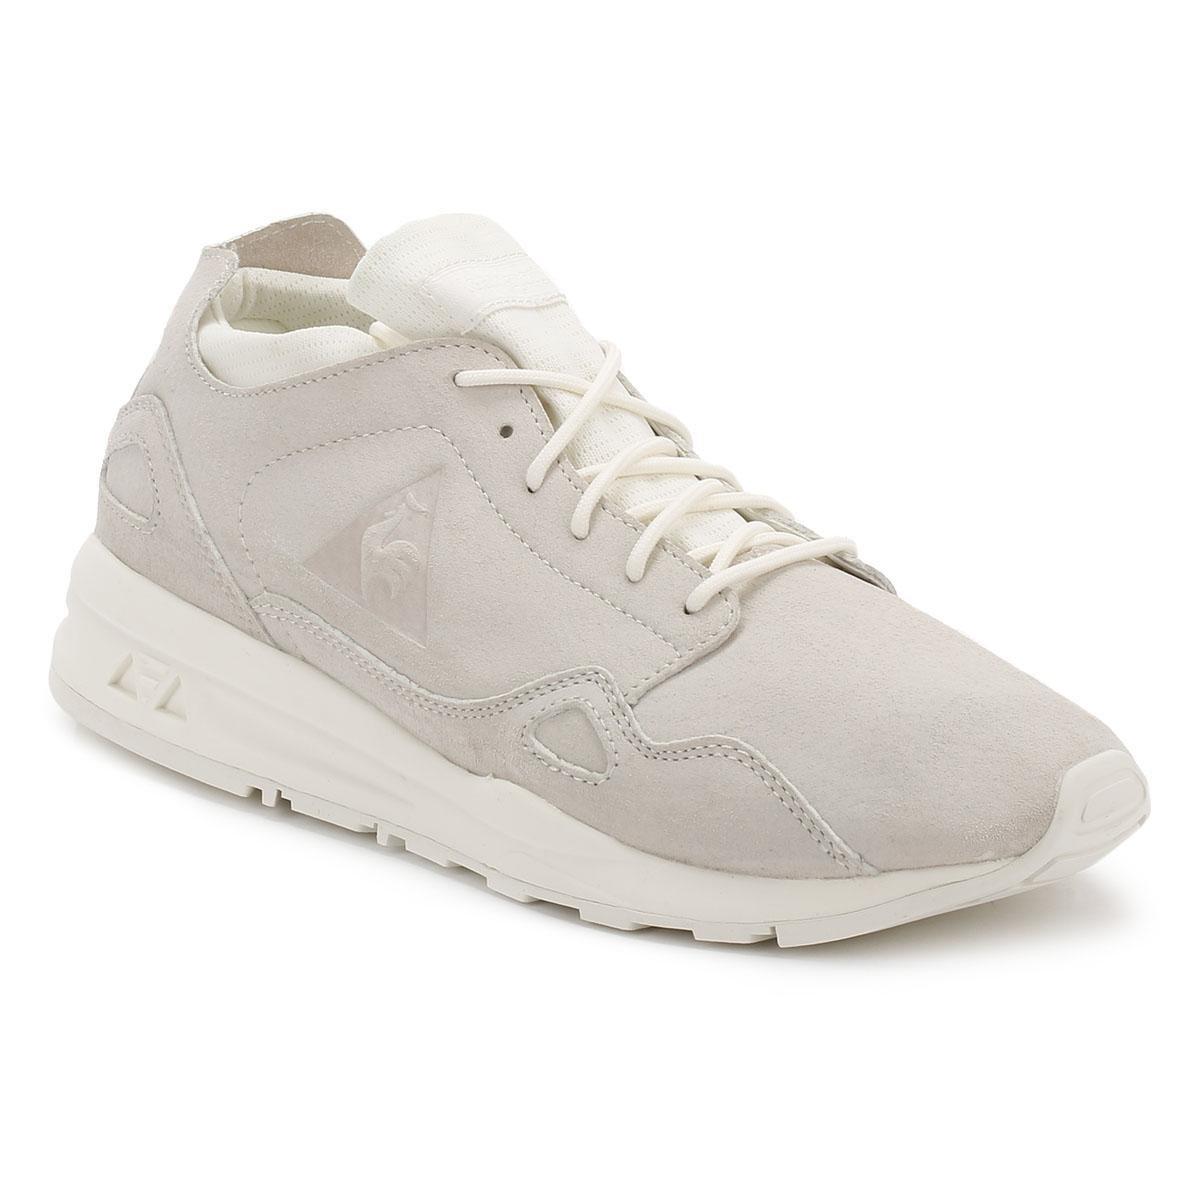 Womens LCS R Flow W Low-Top Sneakers, Rose Cloud Le Coq Sportif